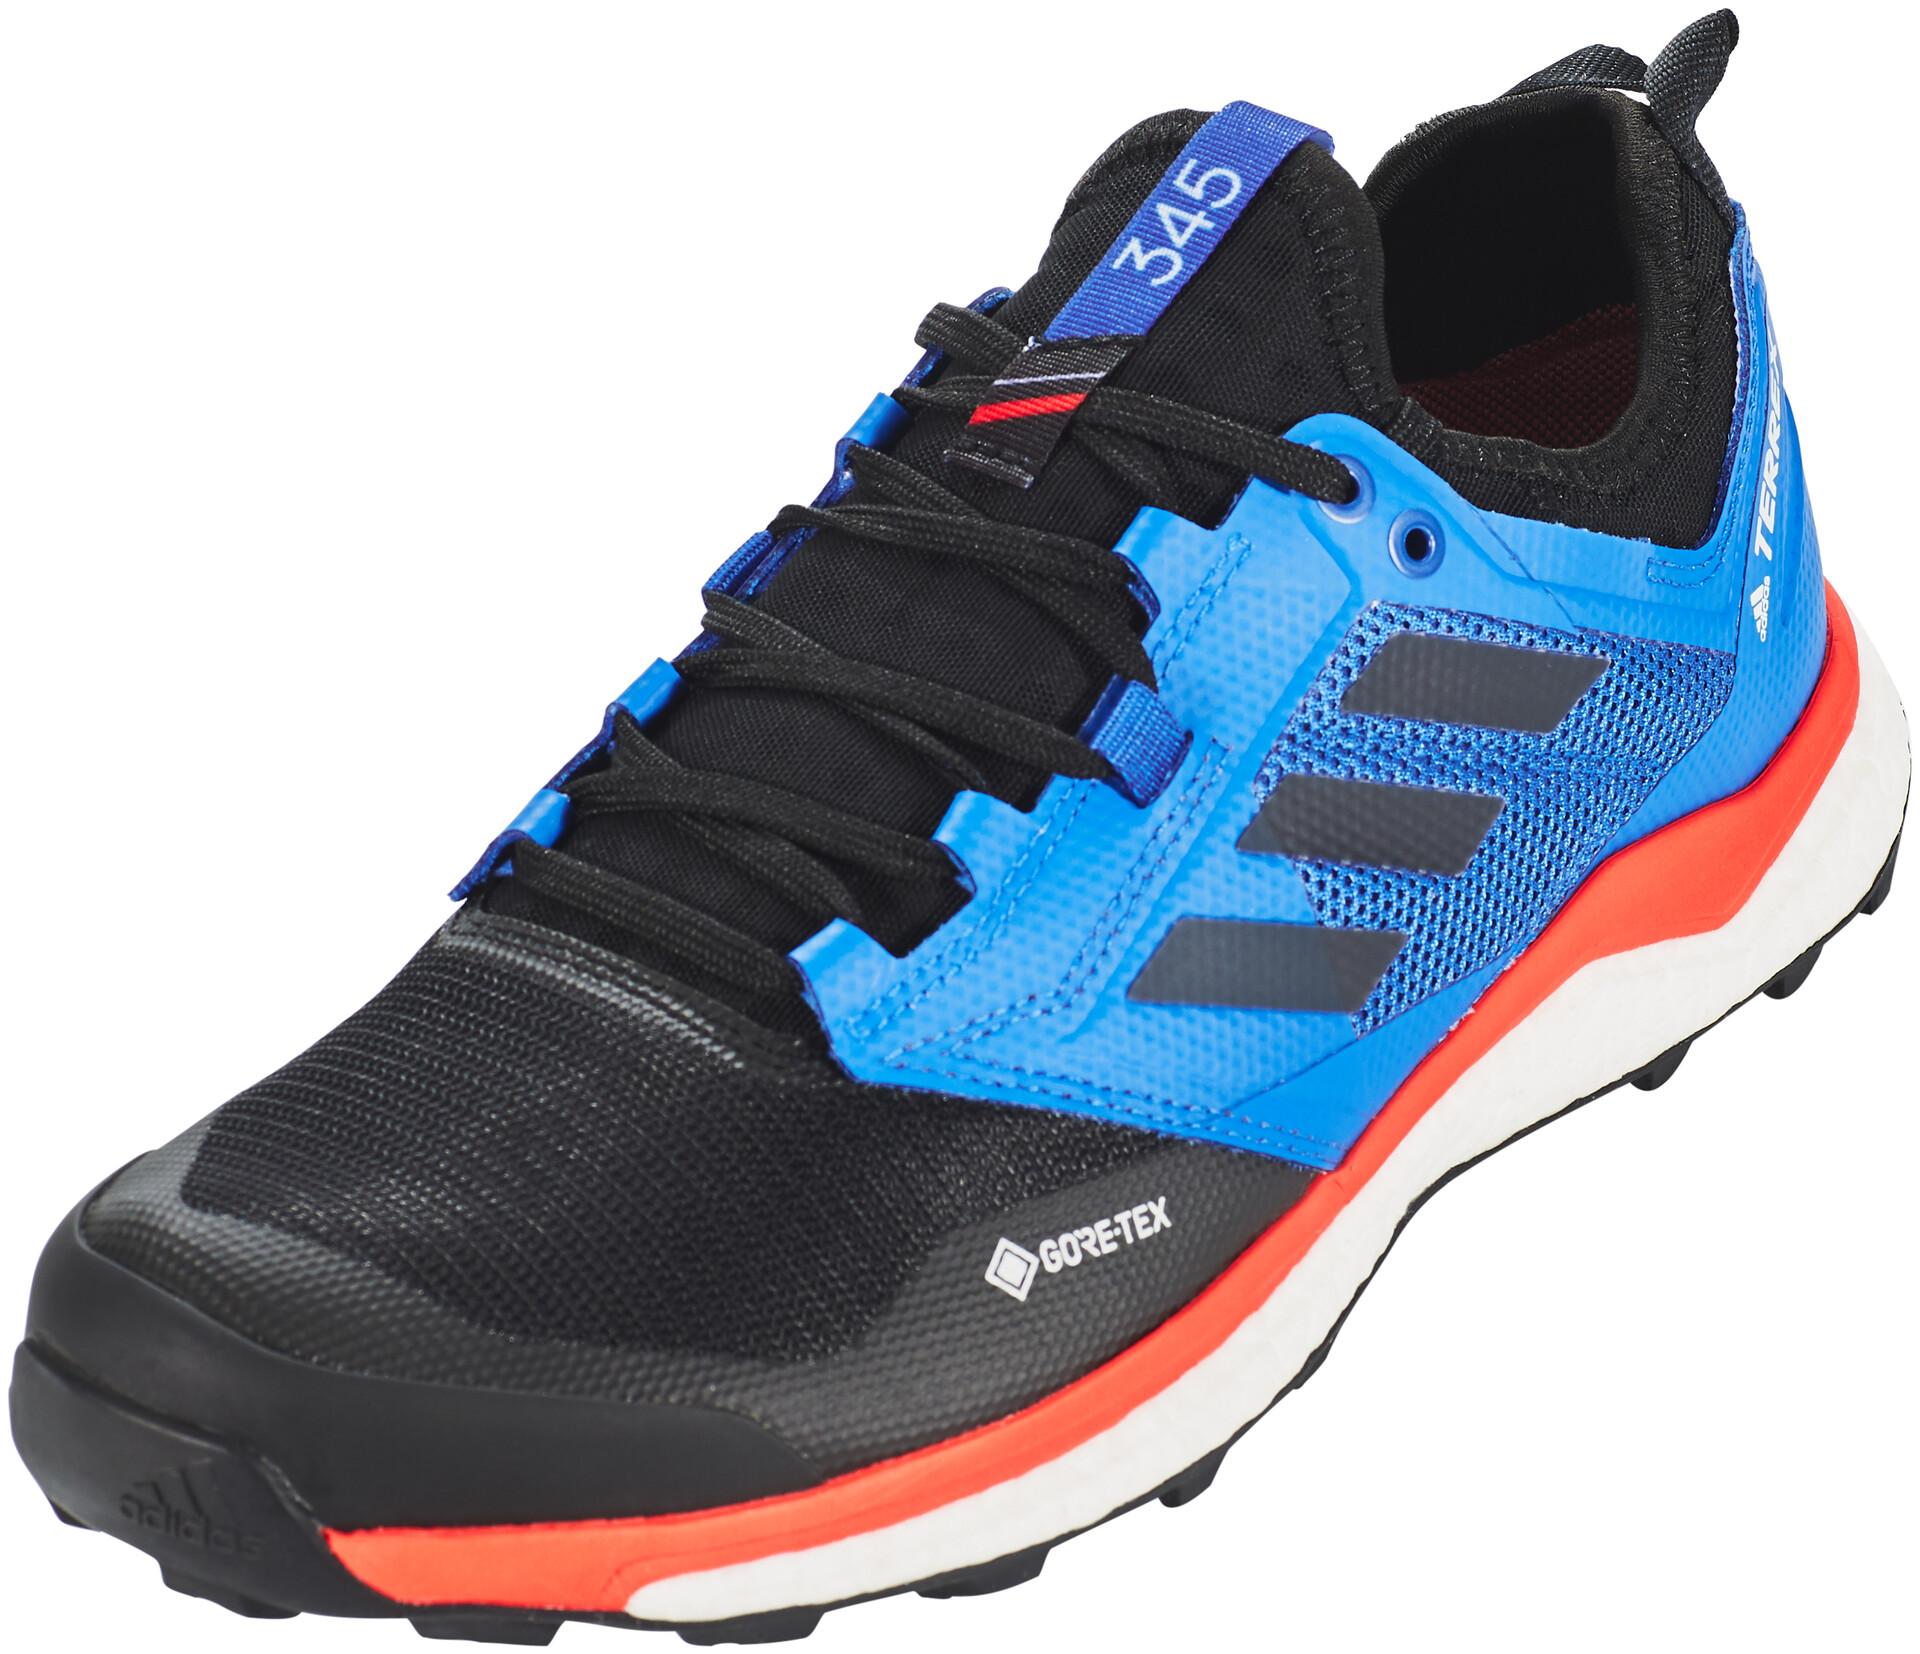 adidas TERREX Agravic XT GTX Schoenen Heren, core black/core black/blue  beauty